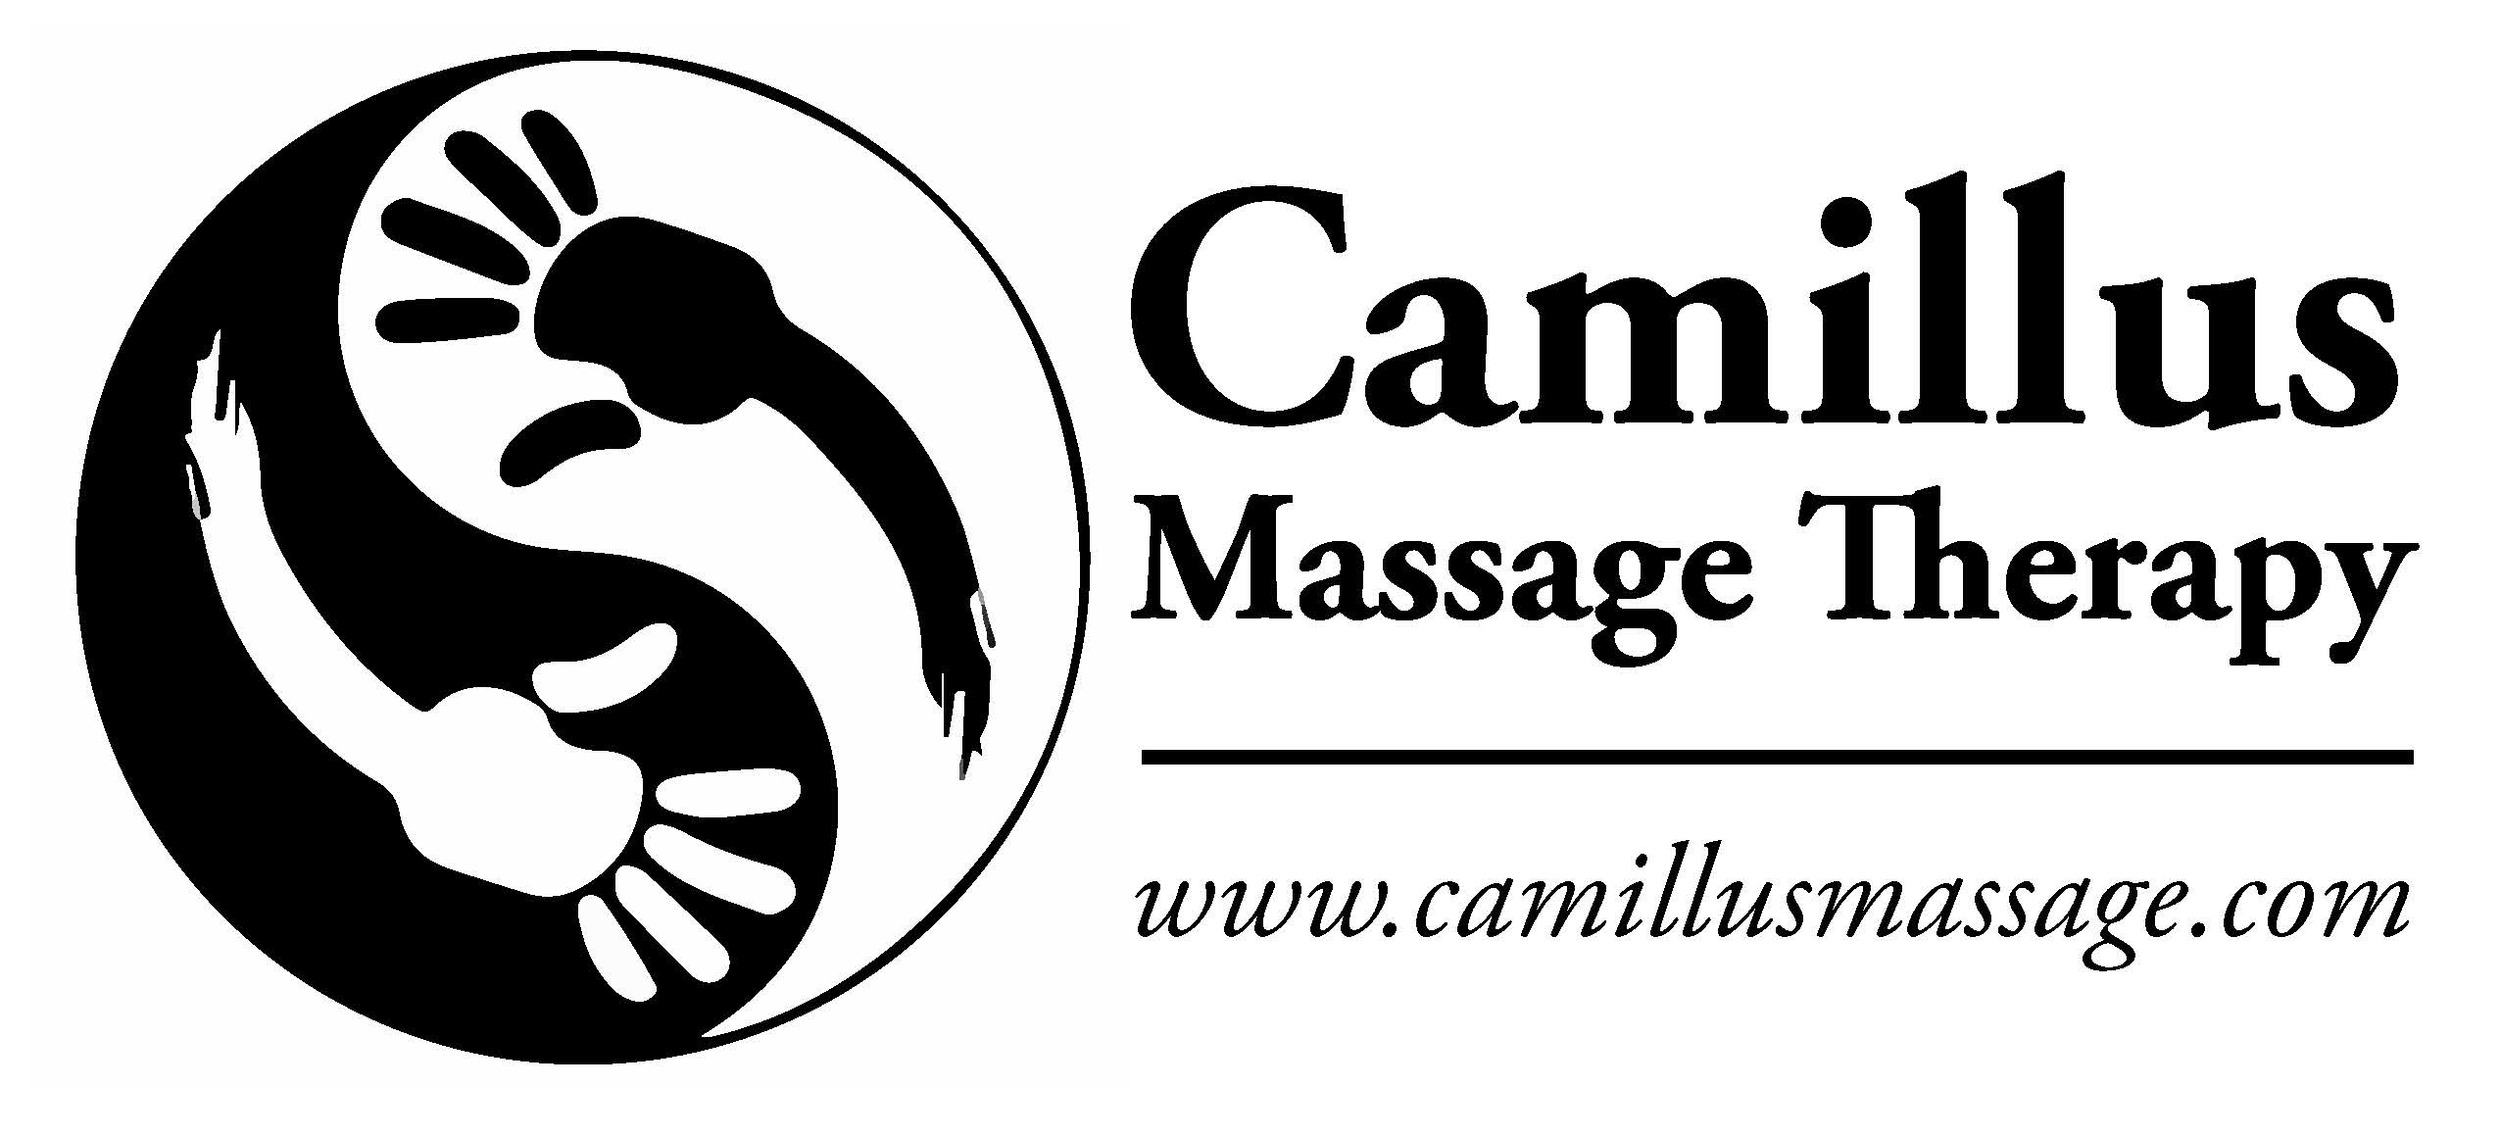 Camillus Massage Therapy logo.jpg